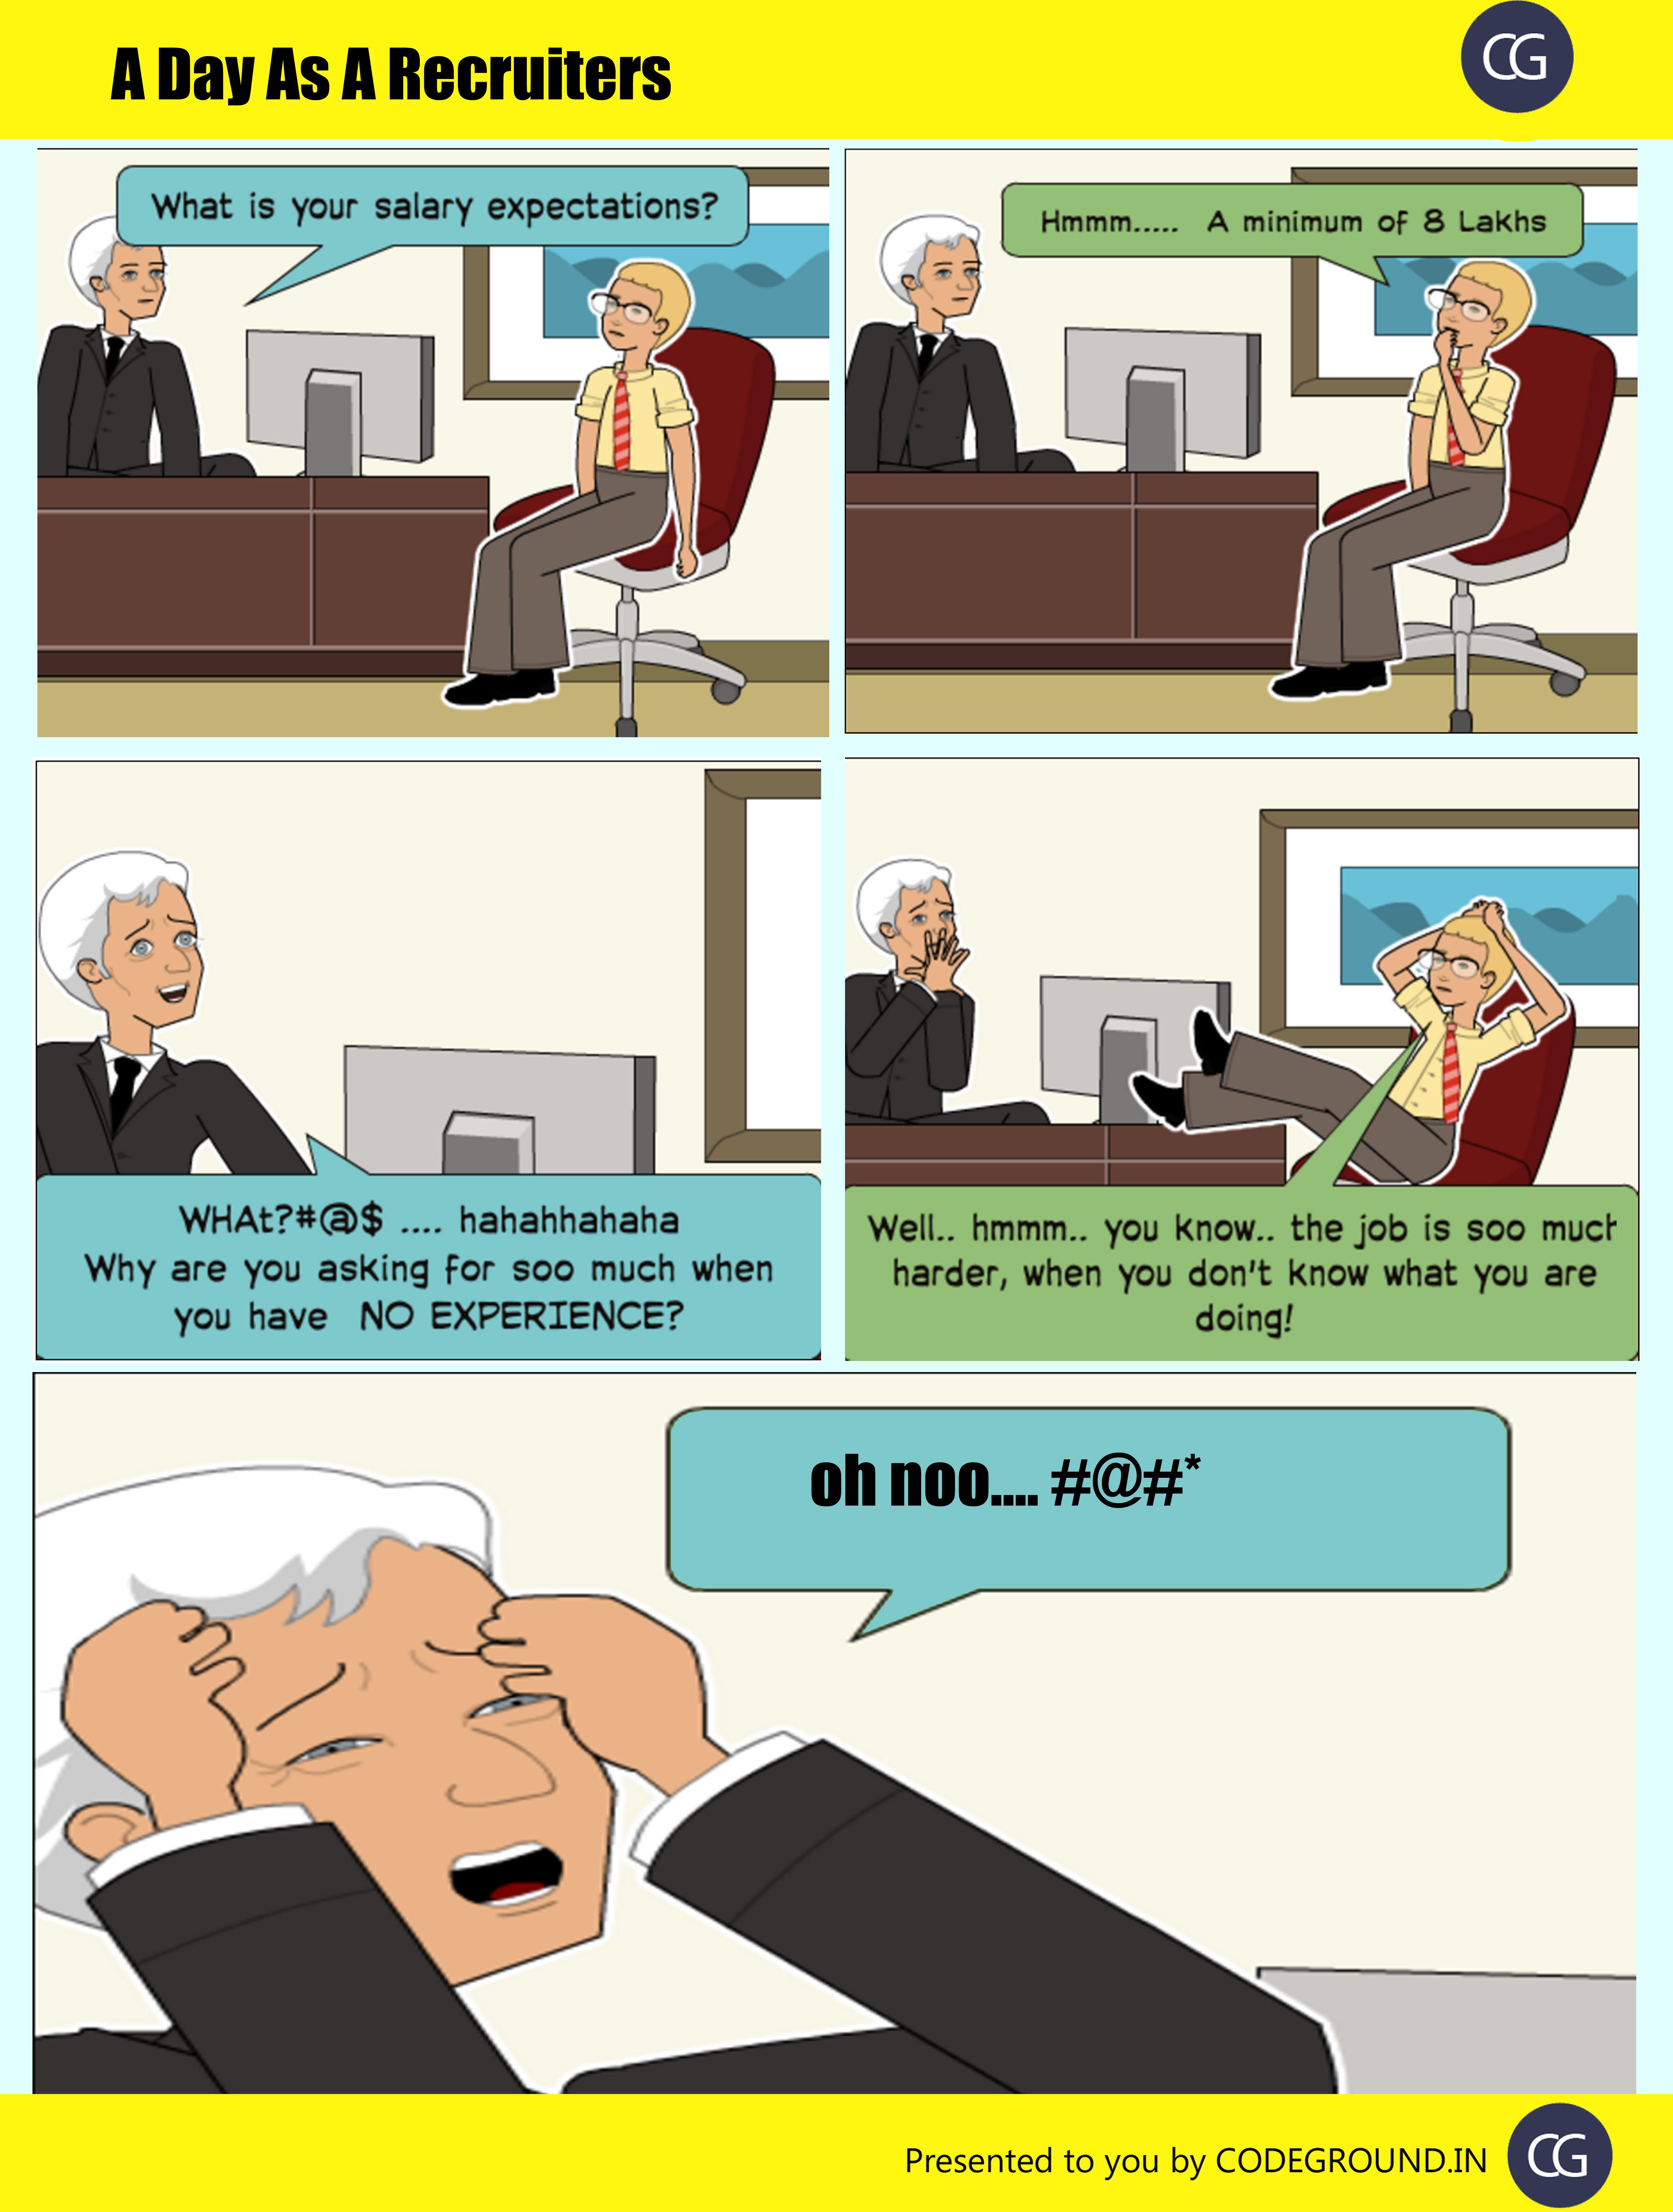 comic-strip-5-day-recruiter